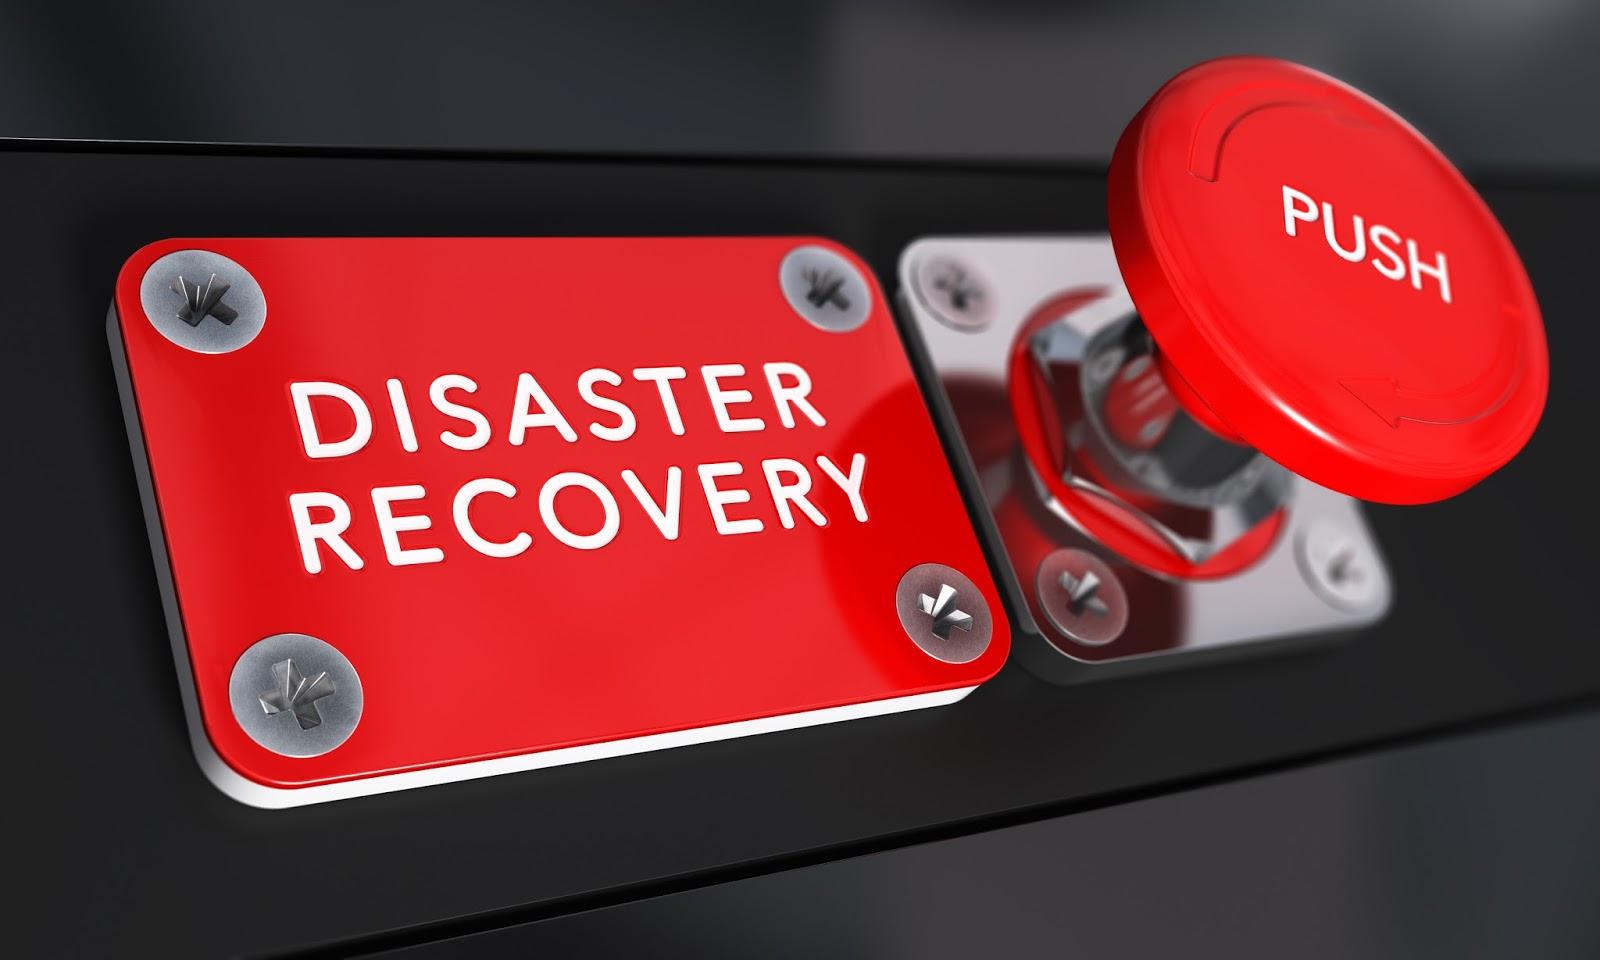 Cloud Backup - Disaster Recovery - OnSAT - Servicios informáticos en Zaragoza